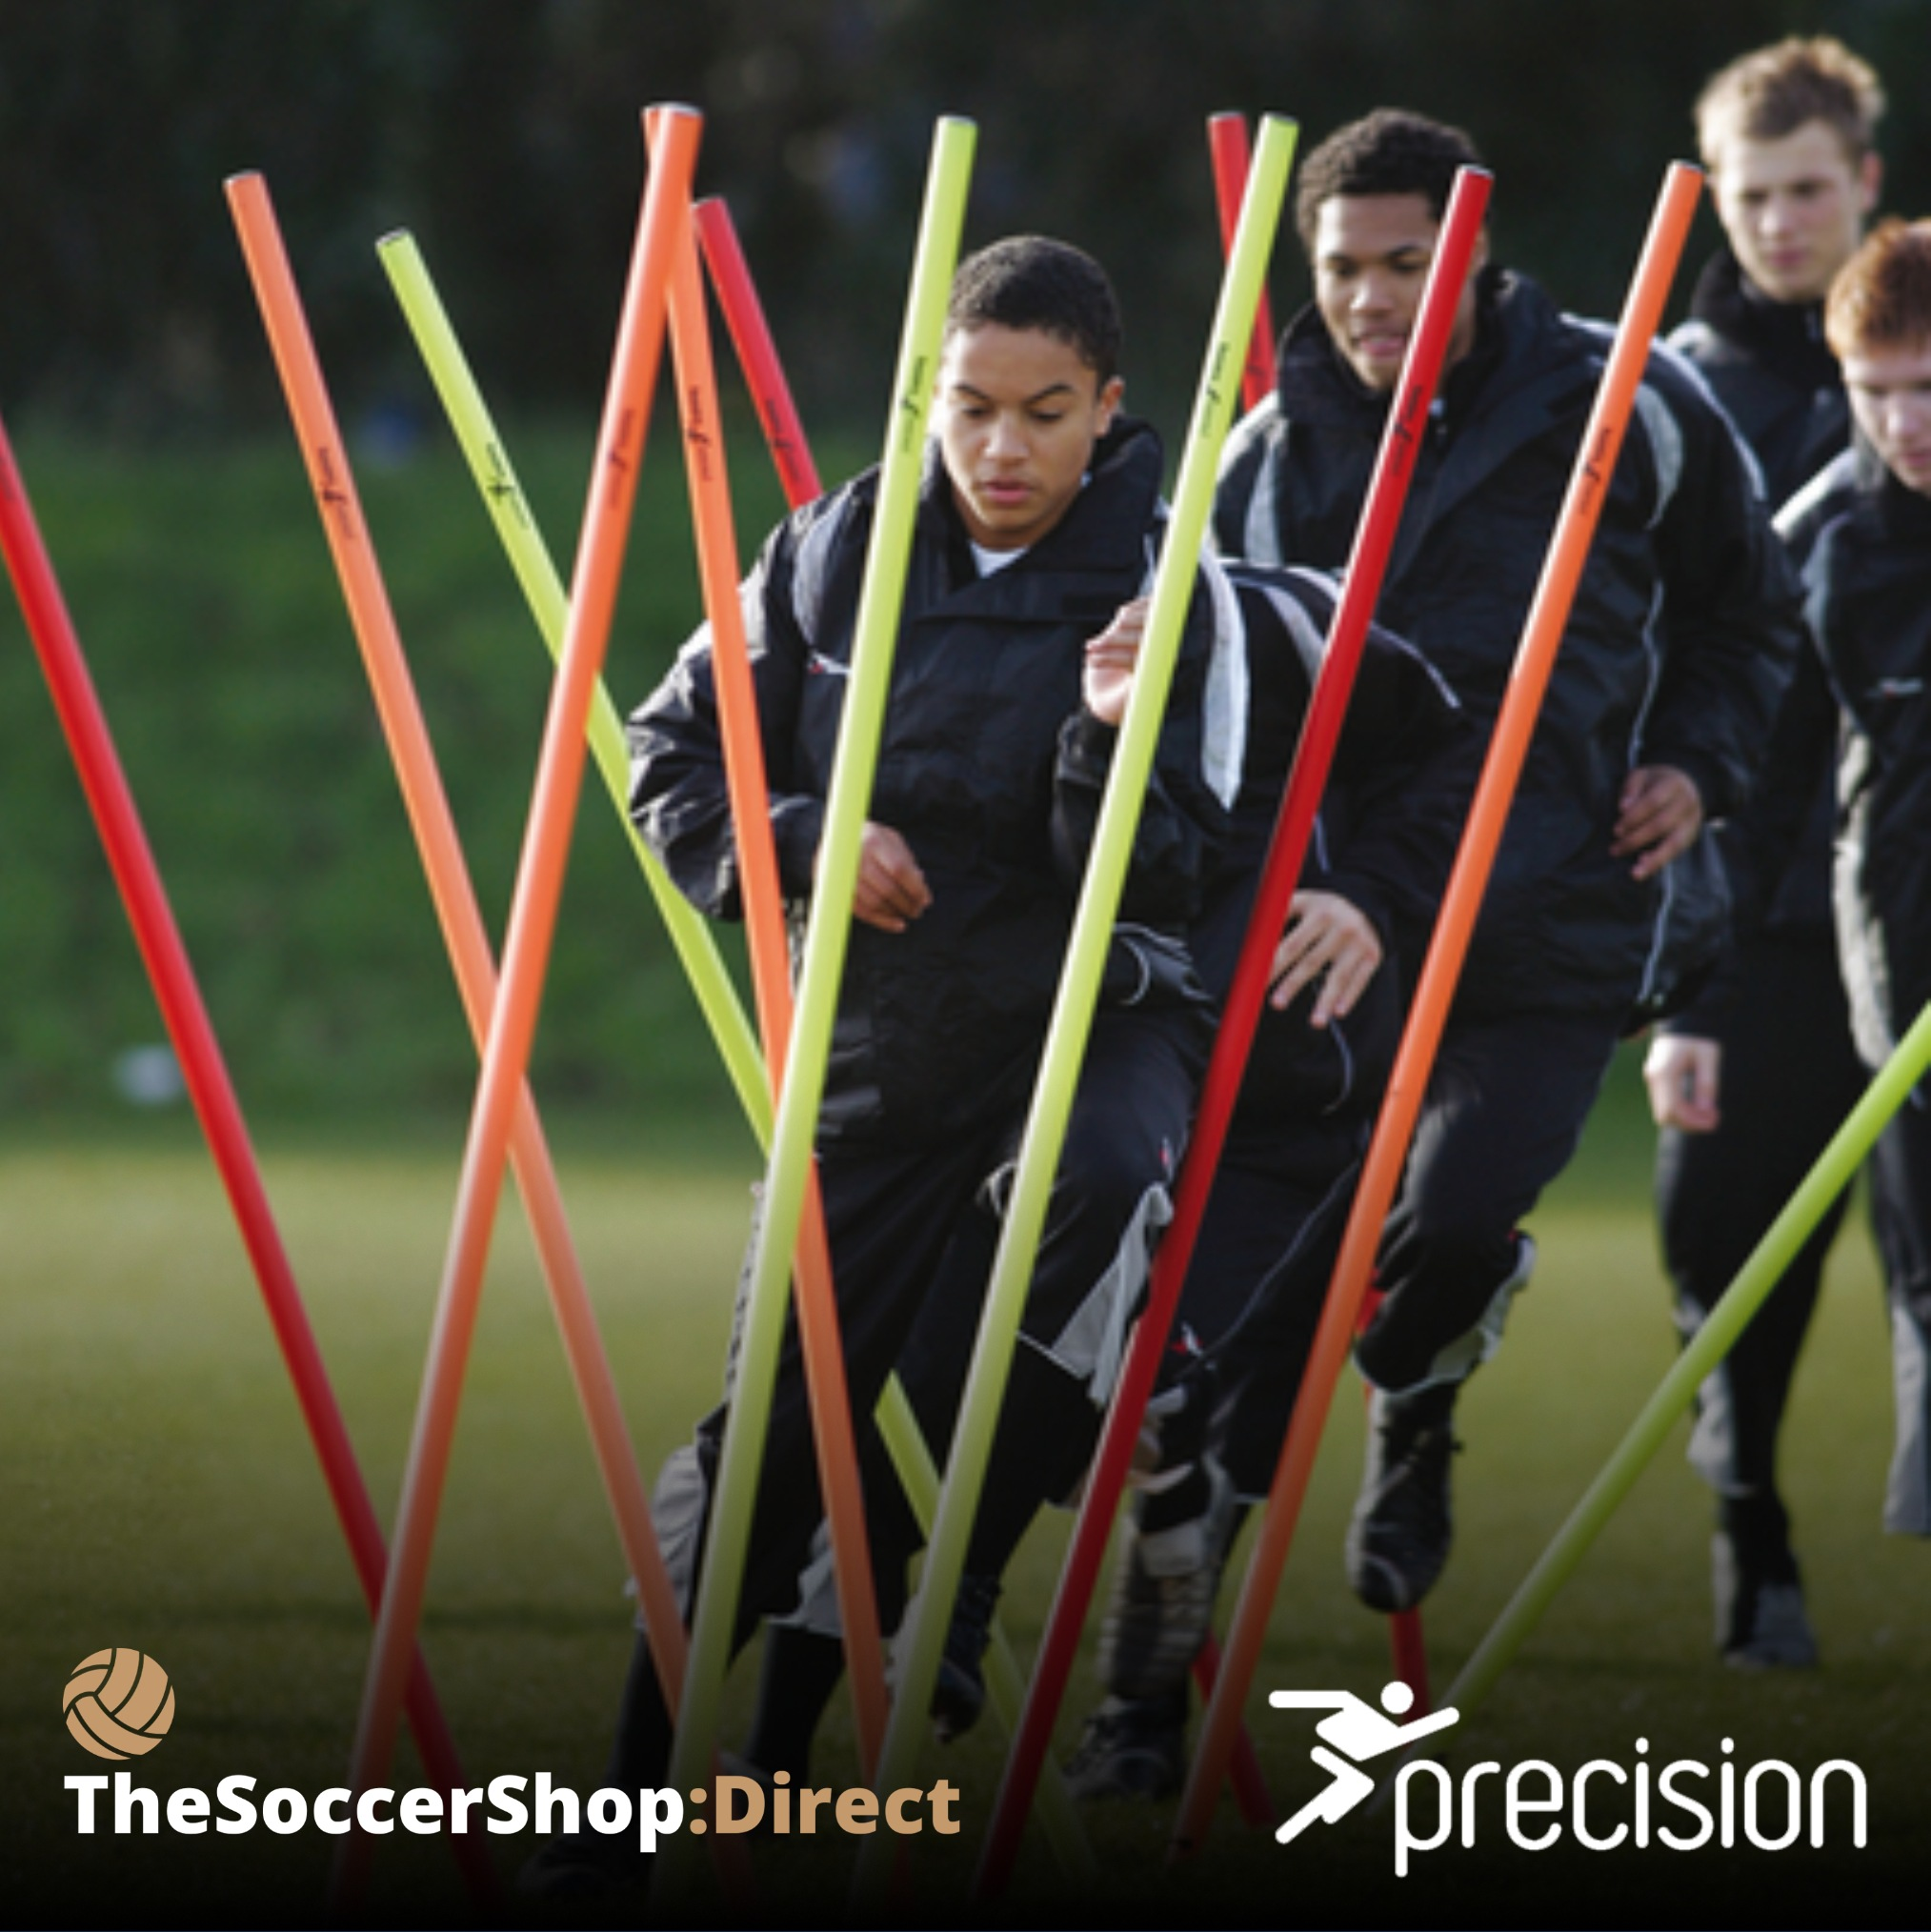 Precision Range